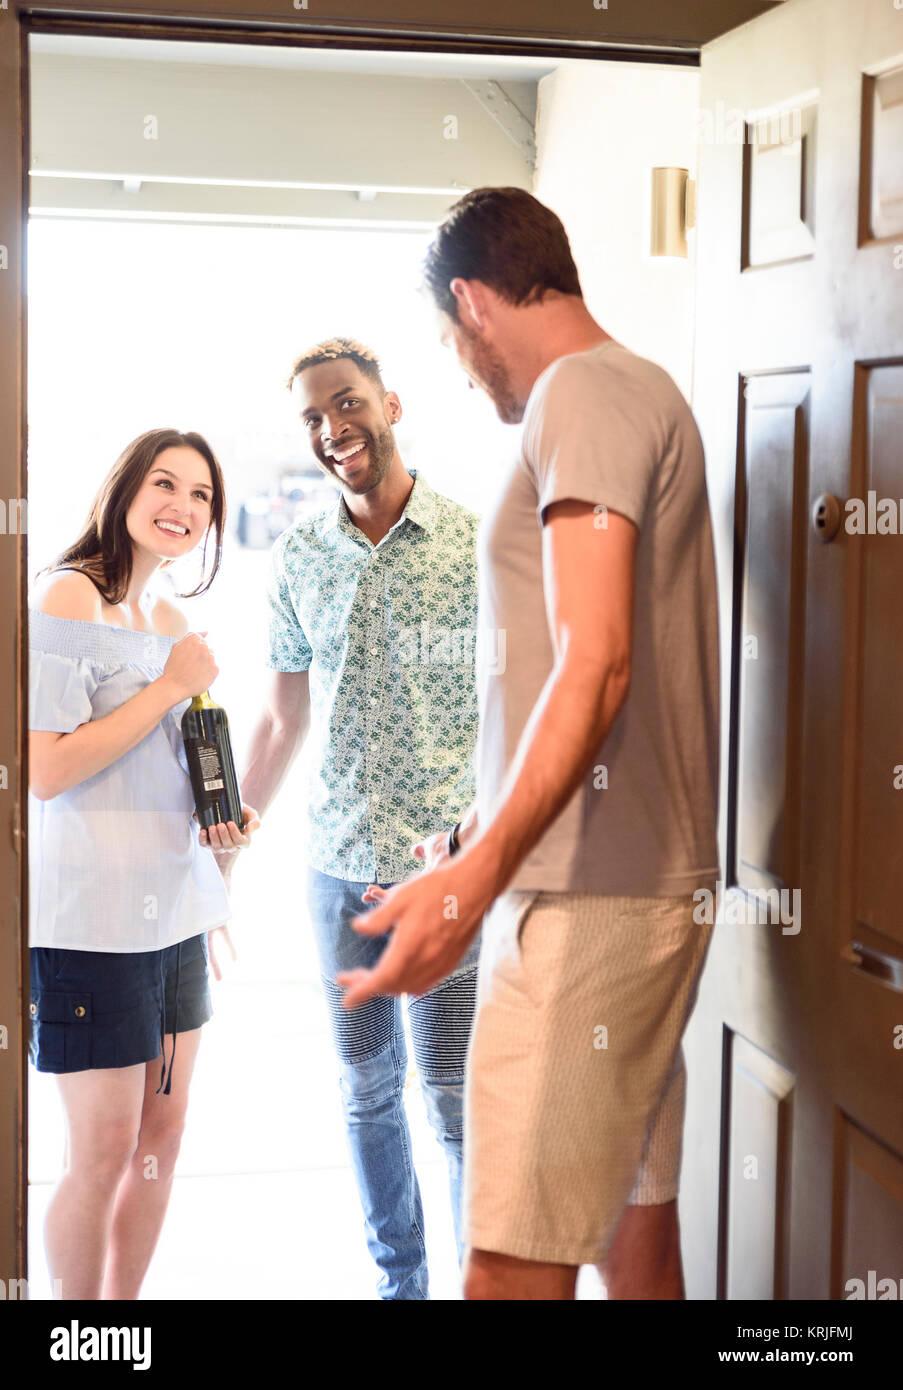 Man greeting couple bringing wine bottle at door - Stock Image